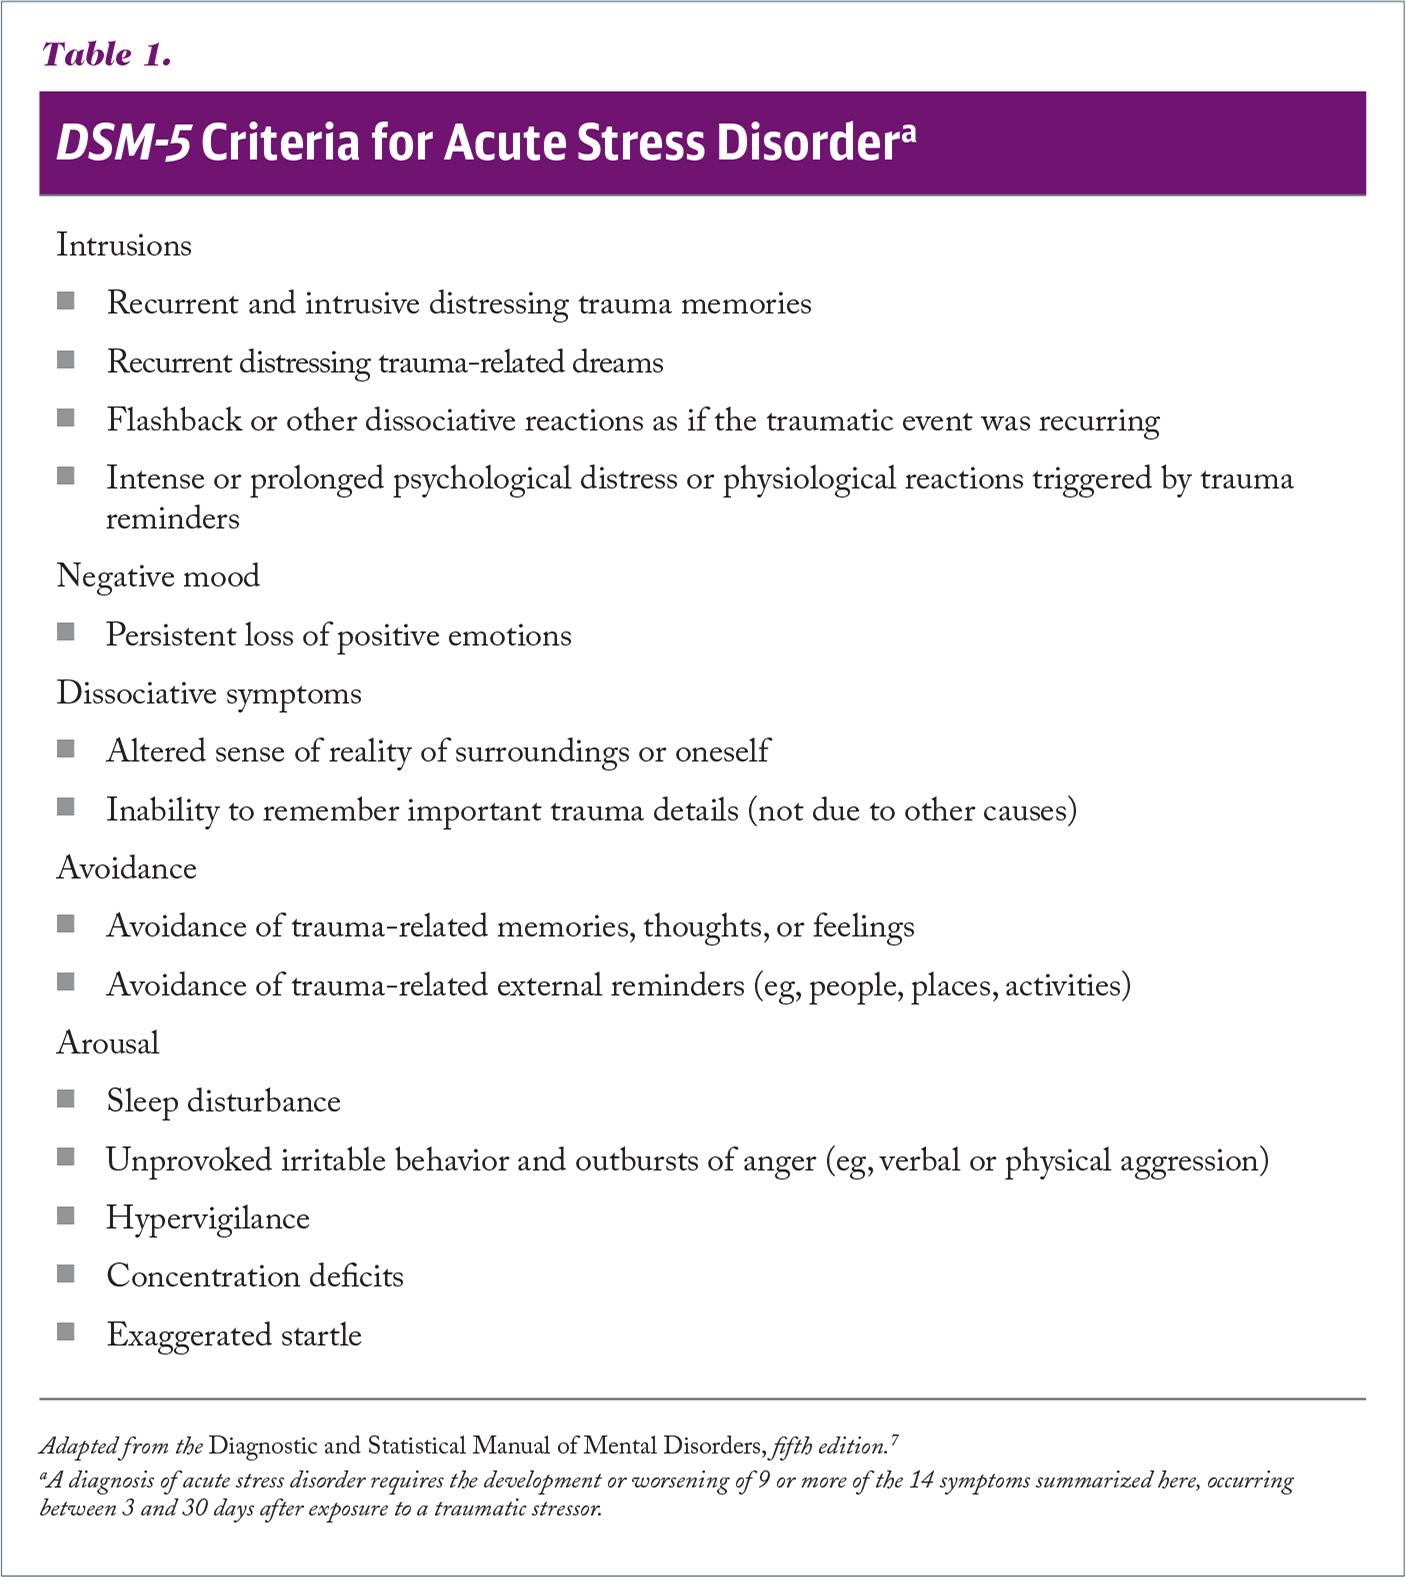 DSM-5 Criteria for Acute Stress Disordera